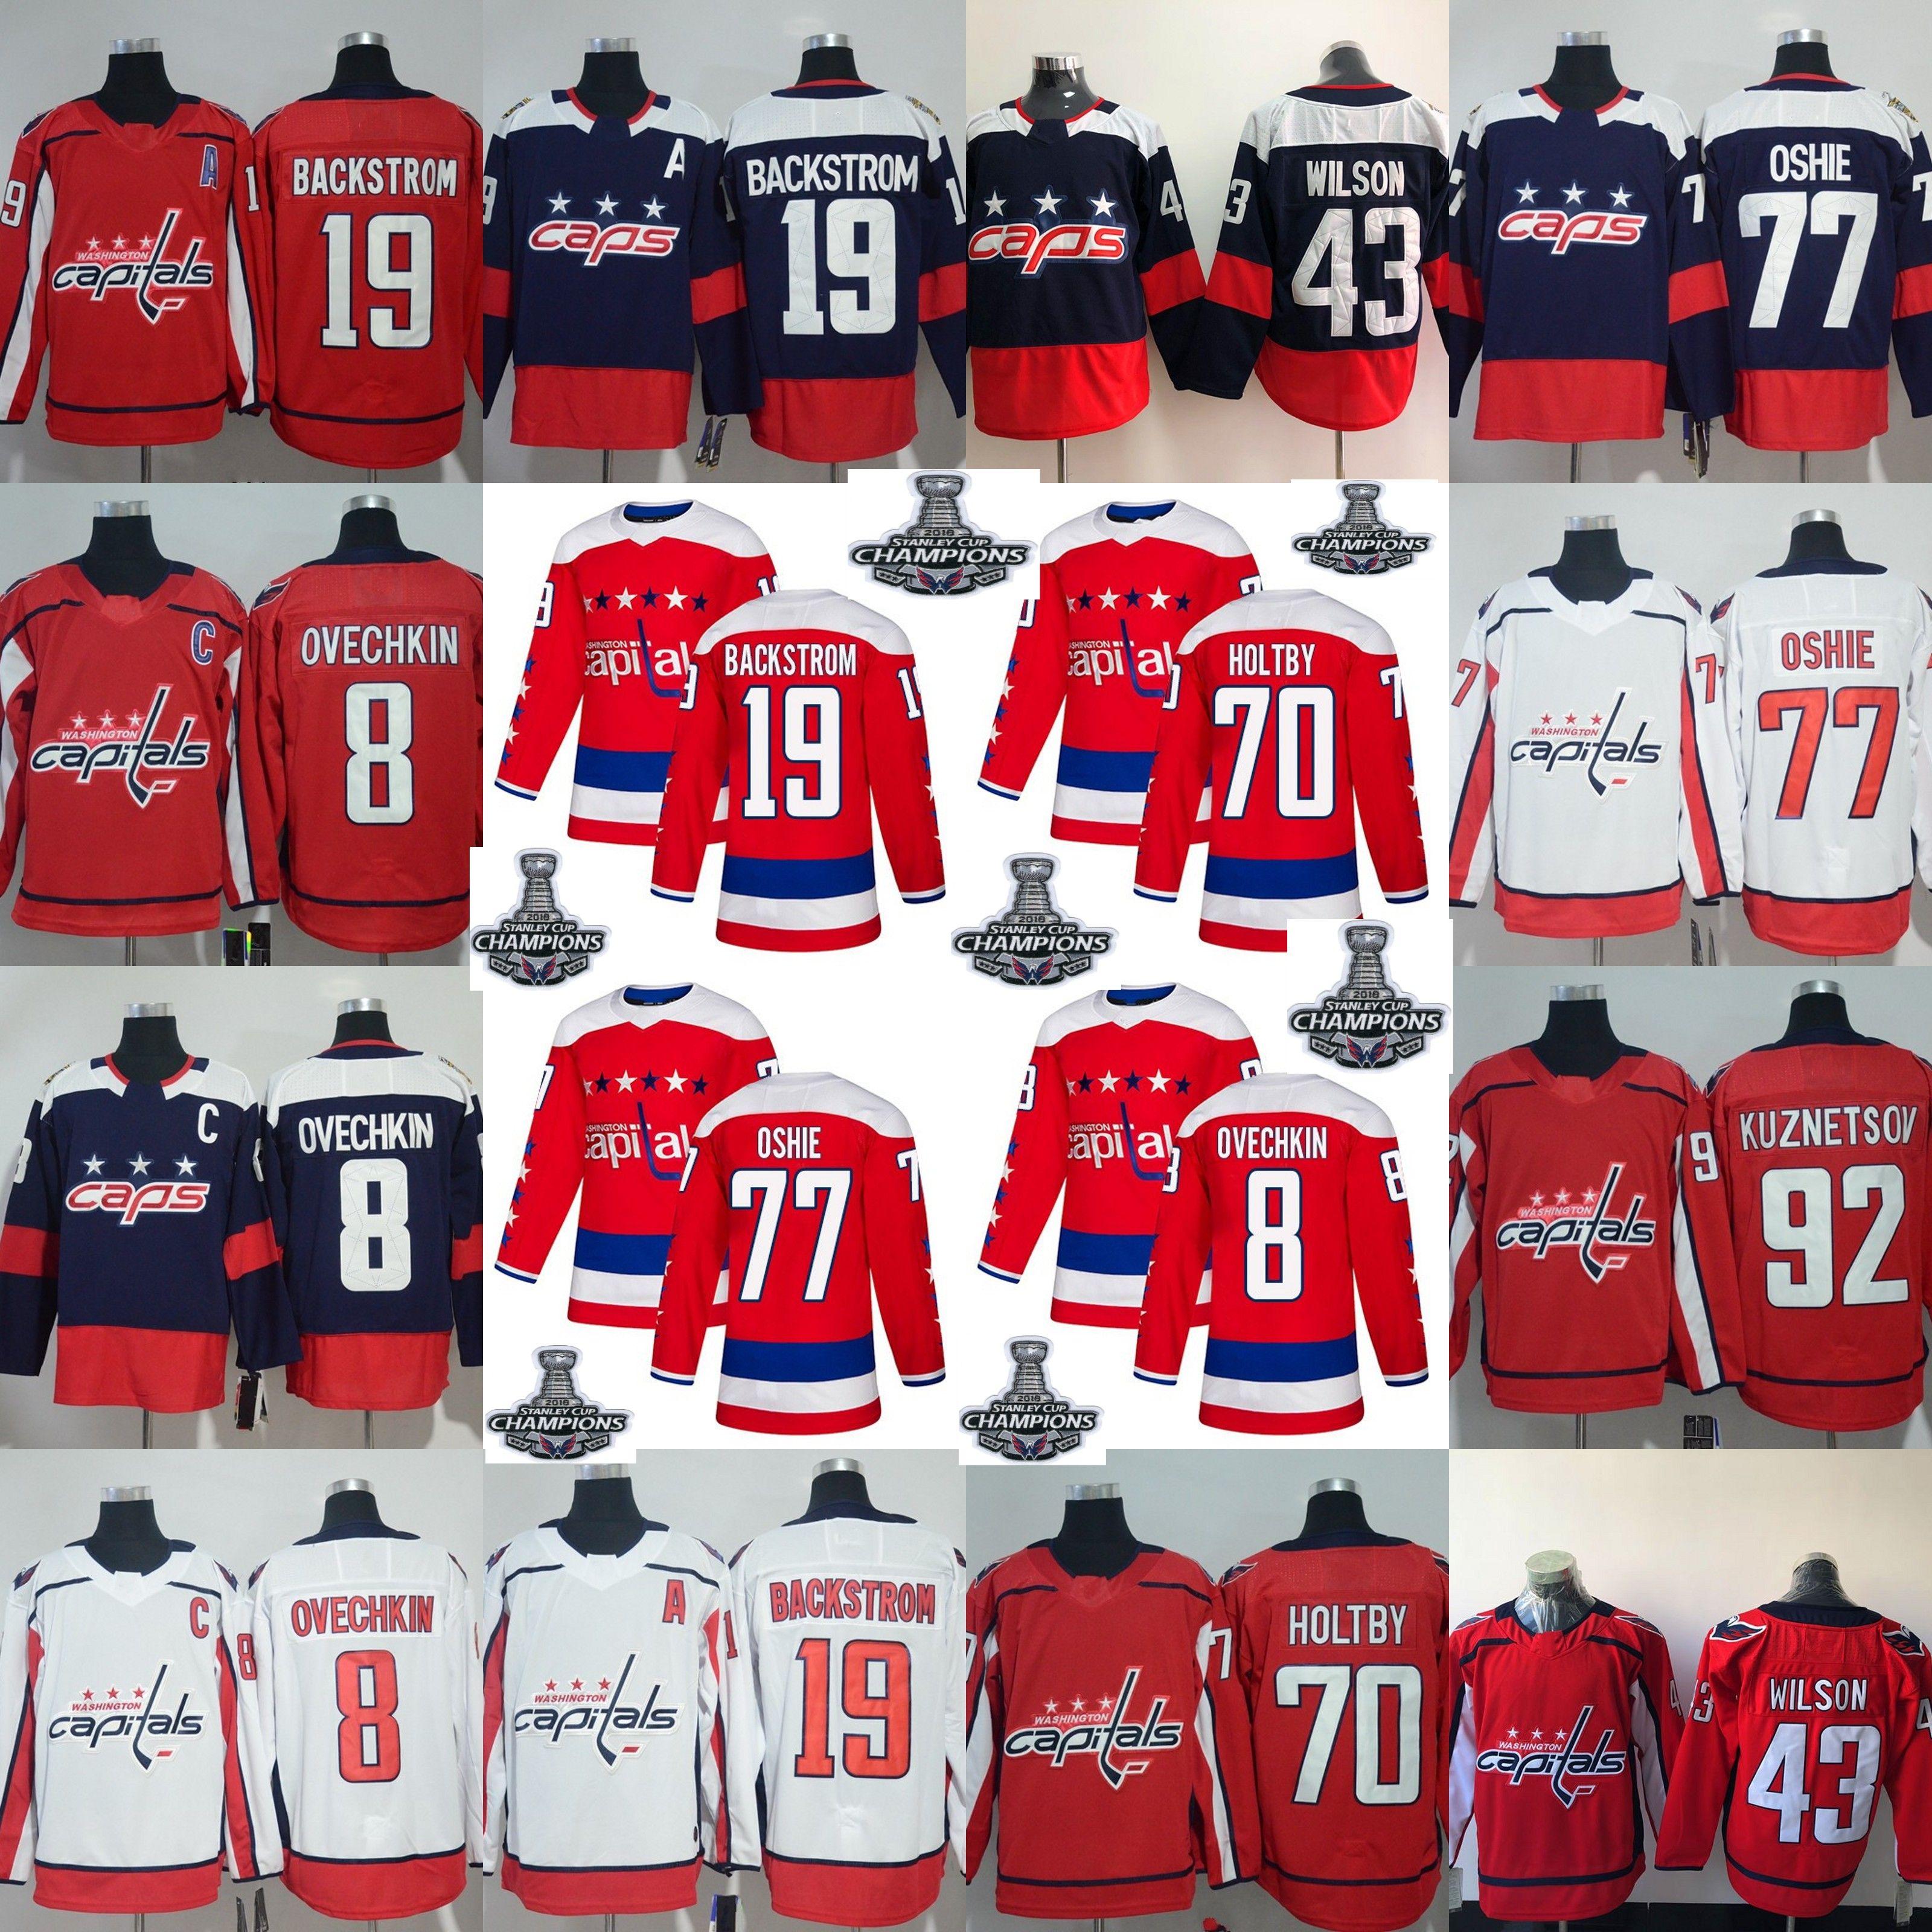 reputable site 378c9 69dd8 men youth women 2018 Stanley Cup Champions Capitals Alex Ovechkin Tom  Wilson T.J. Oshie Nicklas Backstrom Braden Holtby Kuznetsov Jerseys